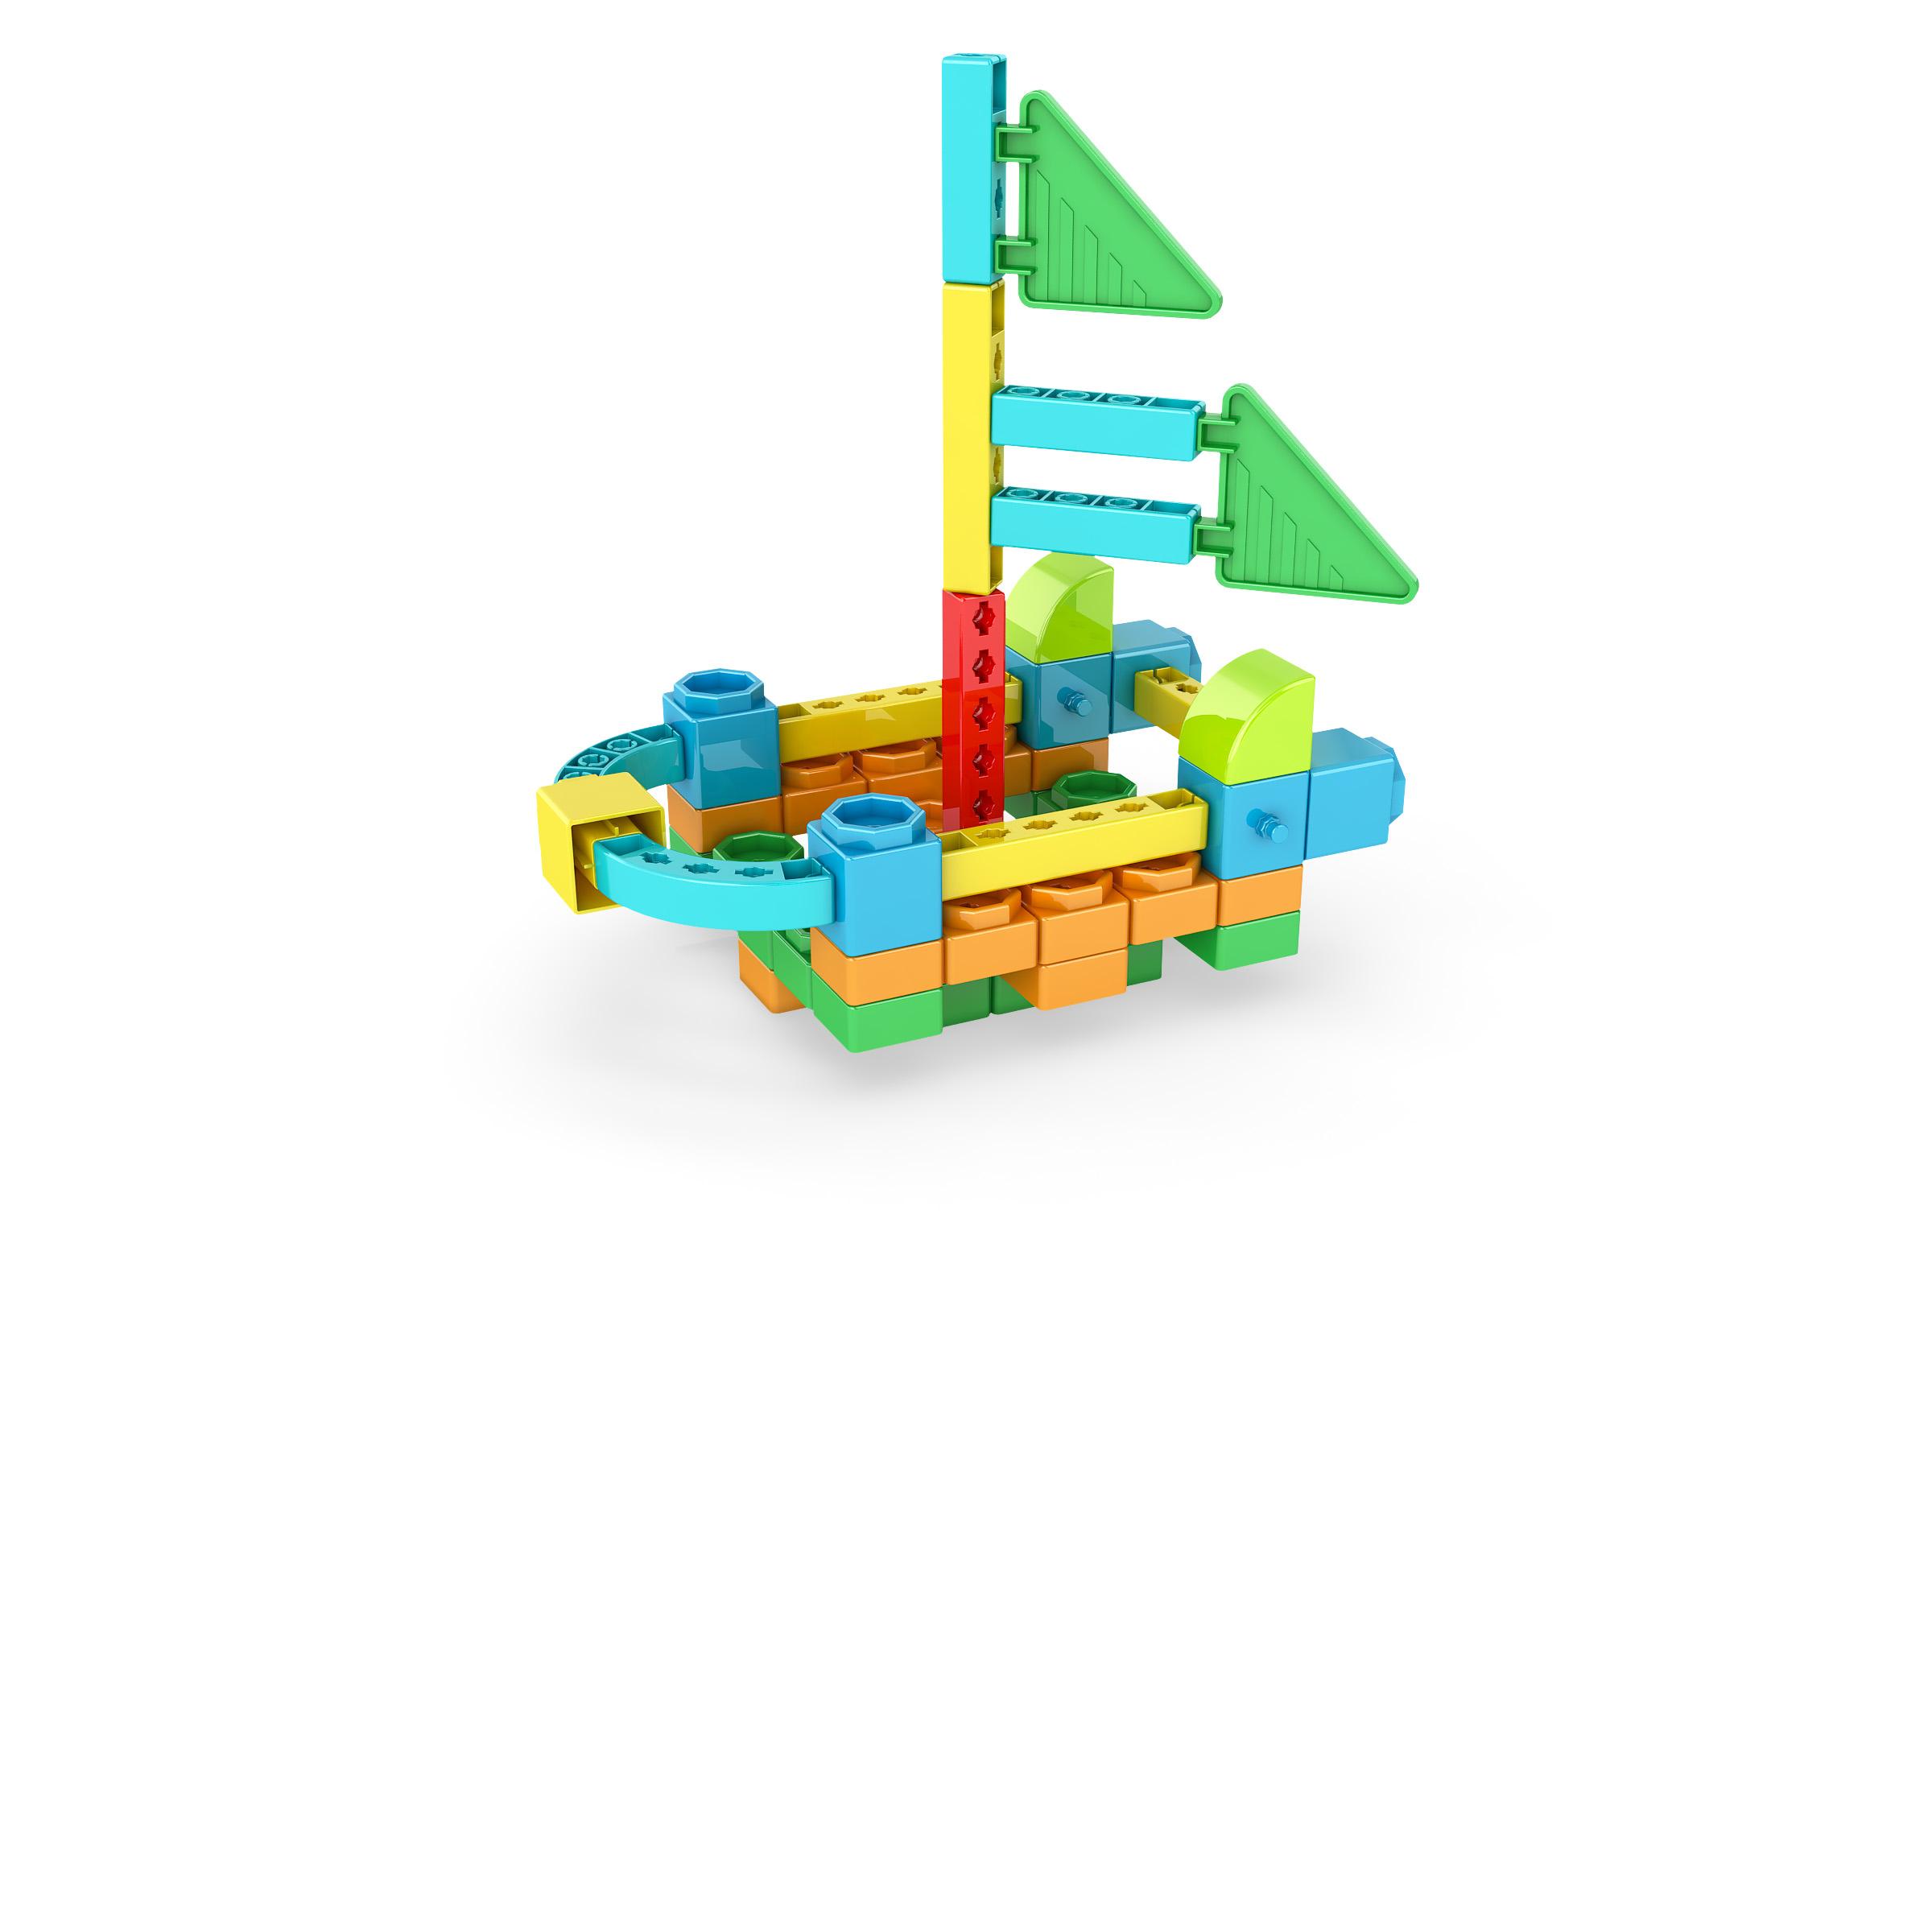 , SailBoat, משחקים לגיל הרך playgro, משחקי קופסא engino, משחק הרכבות אנג'ינו, משחקי רכבות